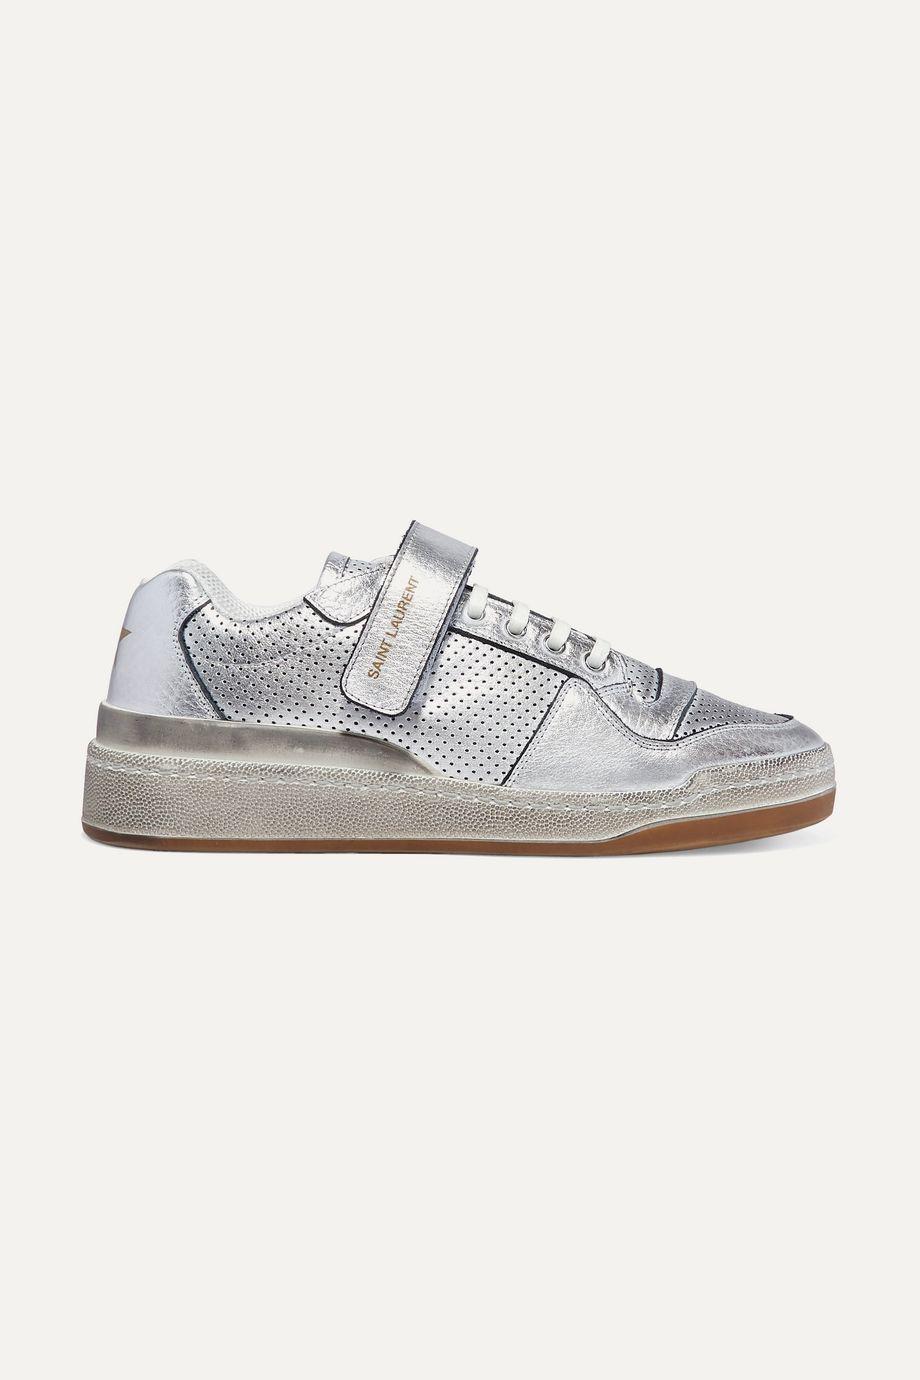 SAINT LAURENT Travis logo-print distressed perforated metallic leather sneakers